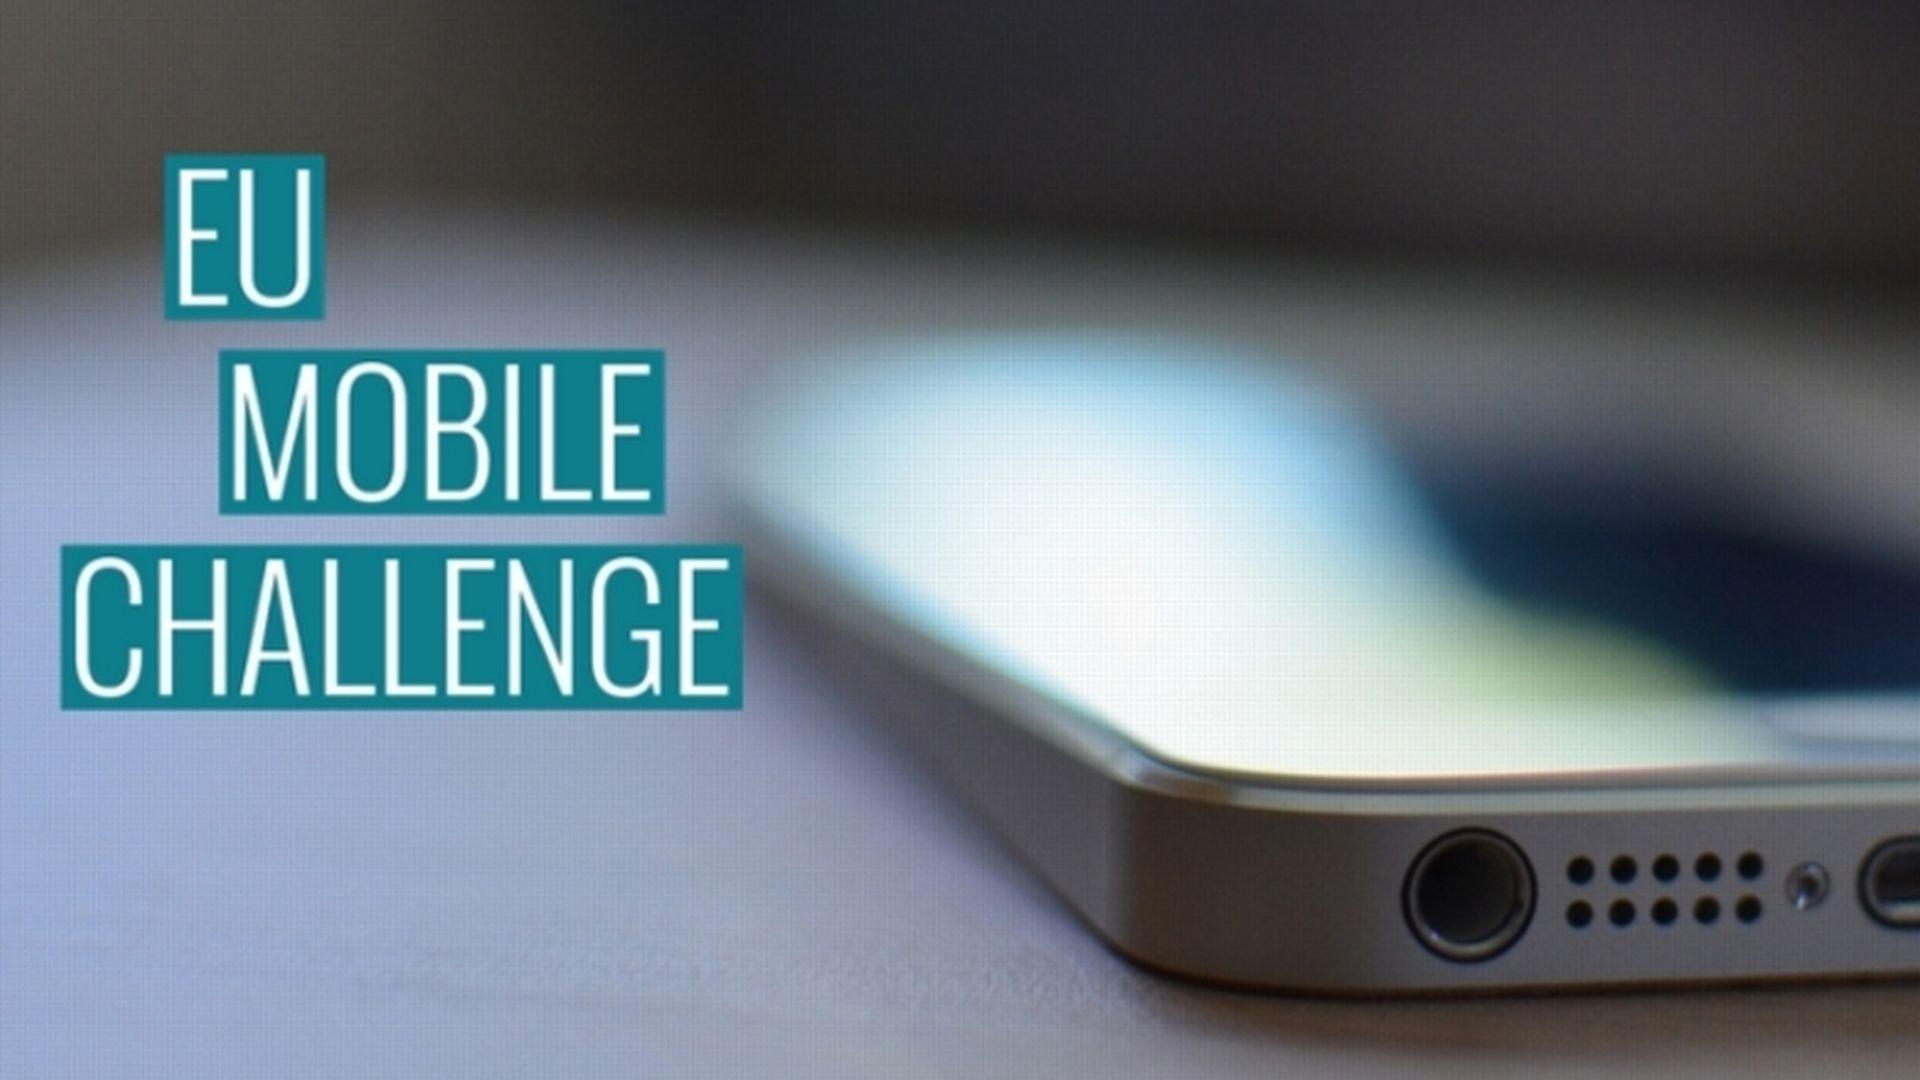 High Tech Campus Eindhoven EU mobile challenge